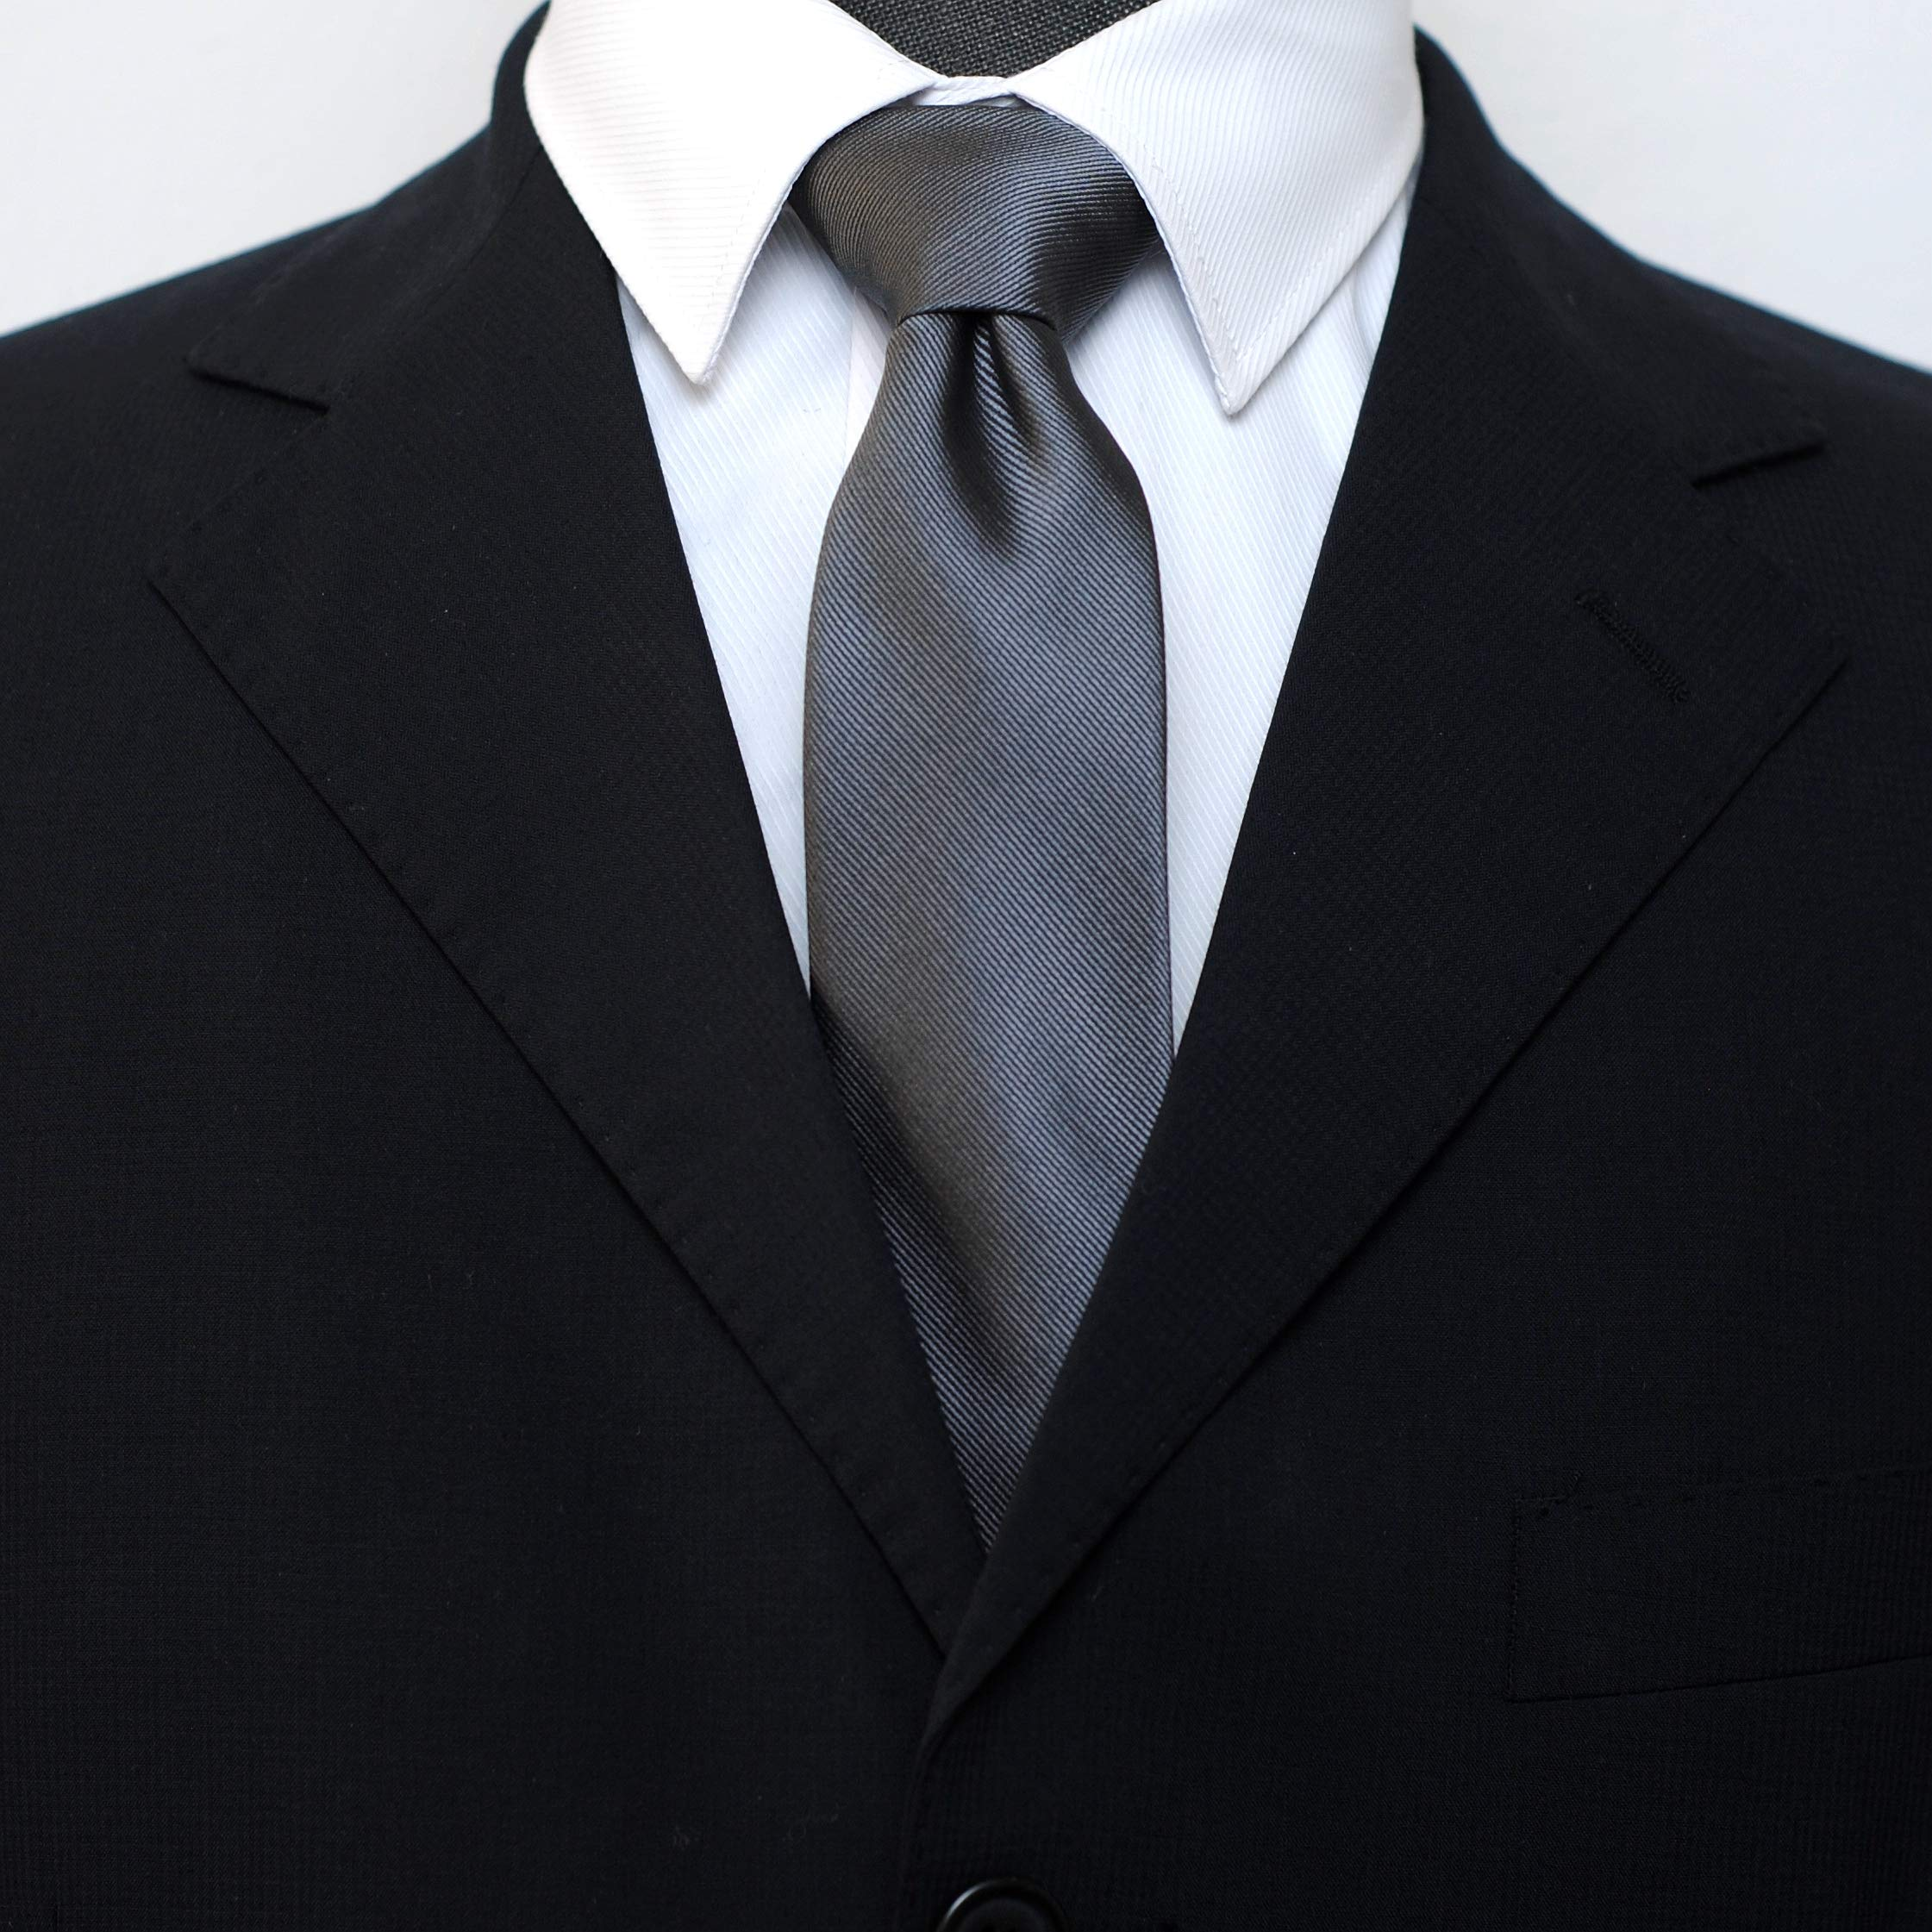 Skinny Solid Color Neckties Wedding Ties for Groomsmen 5 Pack ST518 by ZENXUS (Image #3)